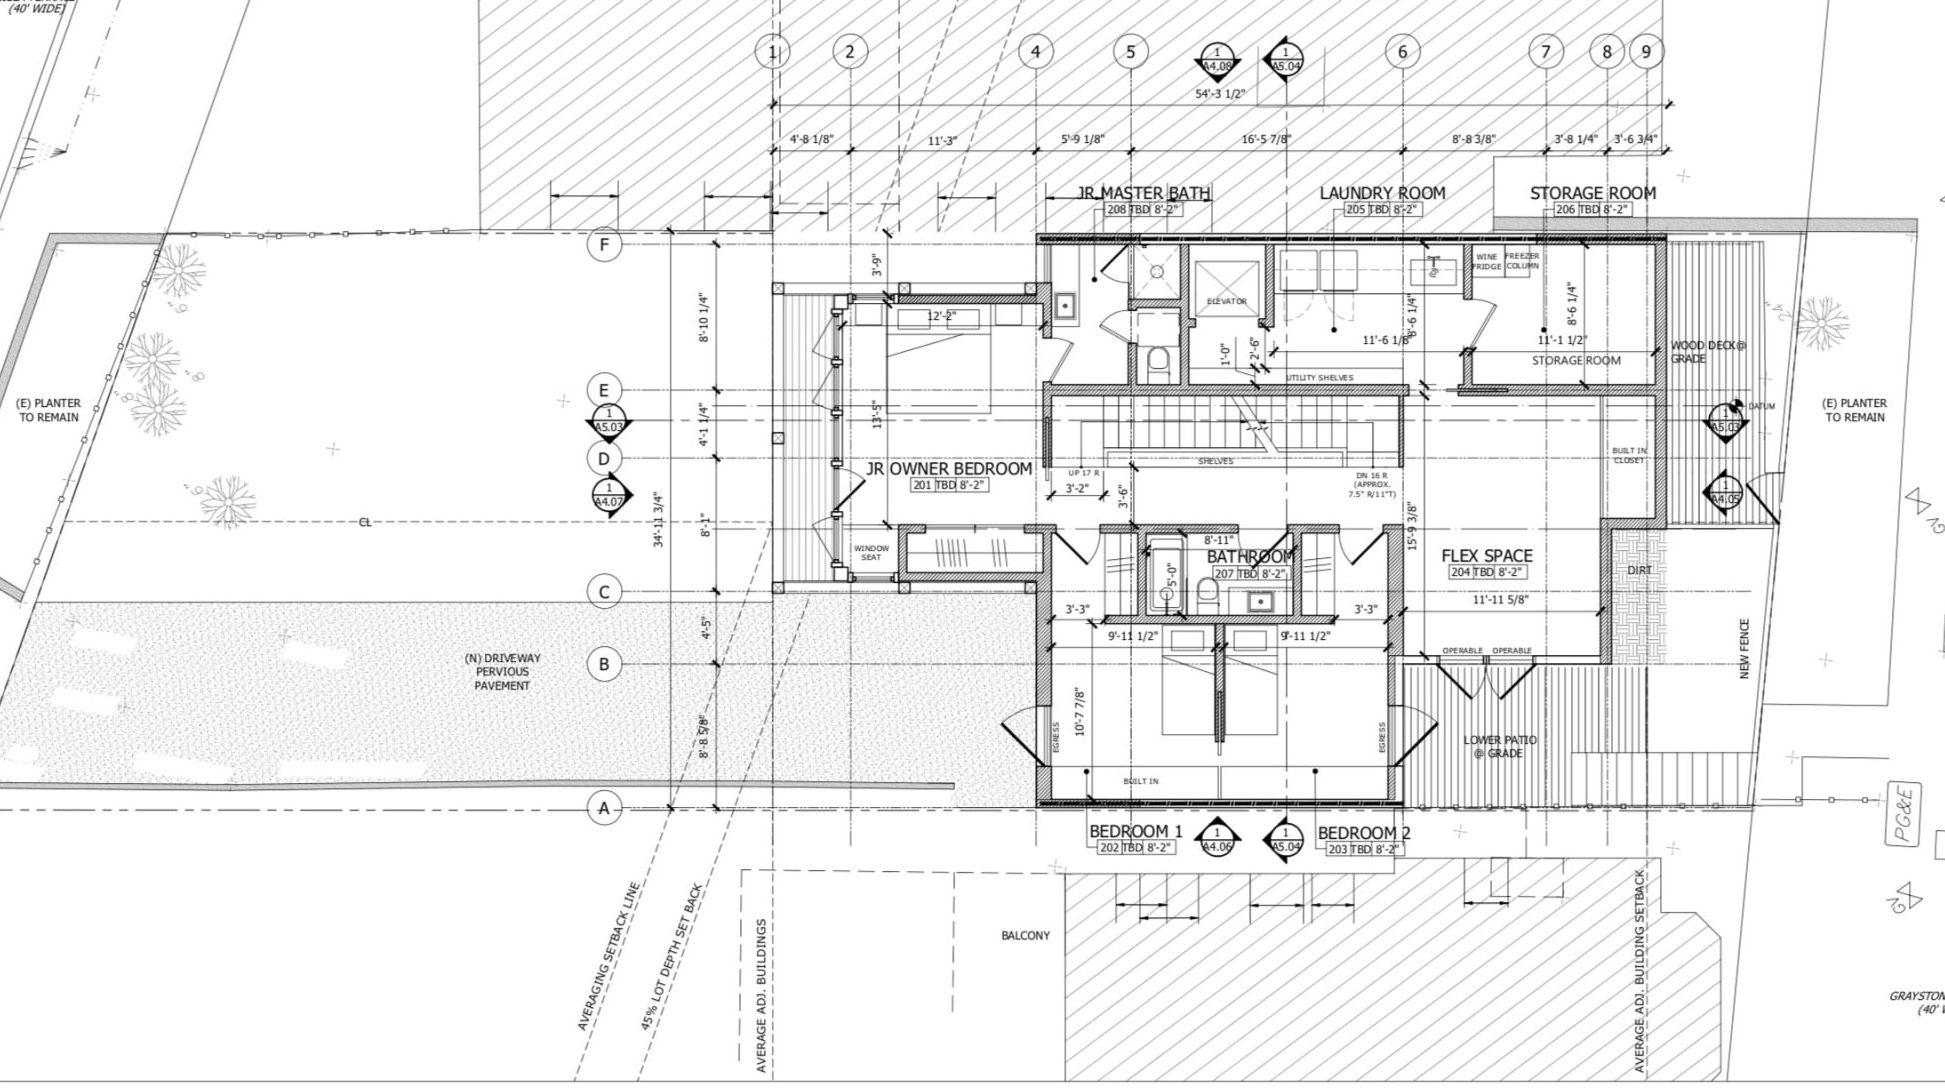 135 Graystone Terrace Second Floor Plan